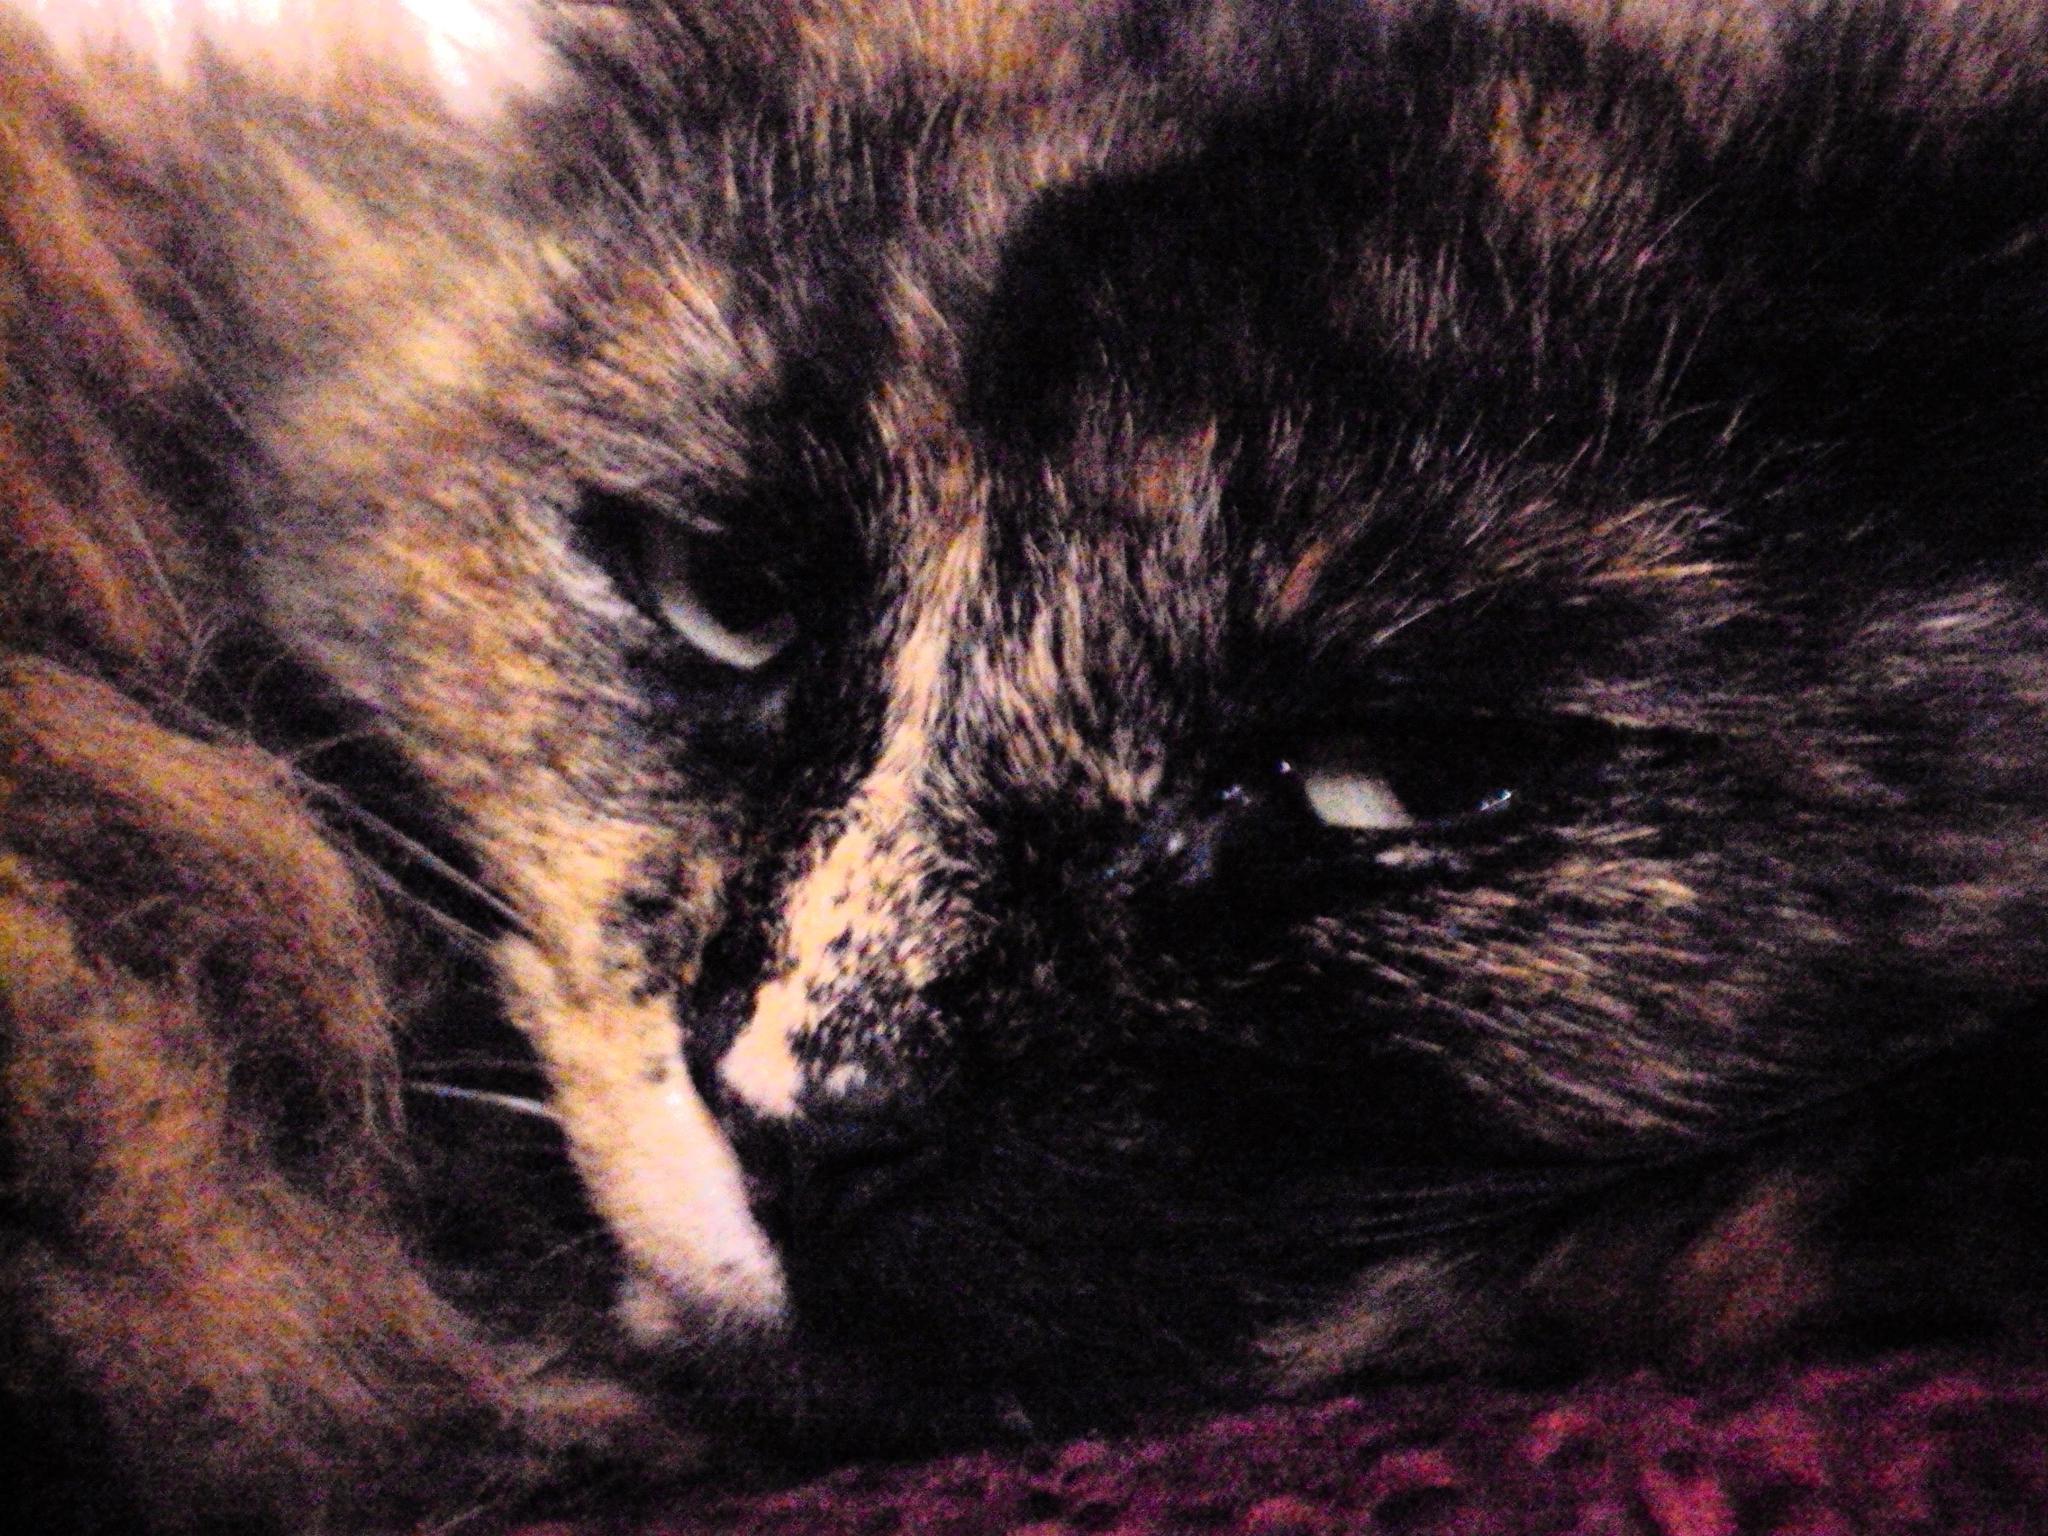 Sleepy kitty by Mahnaz & Yelda